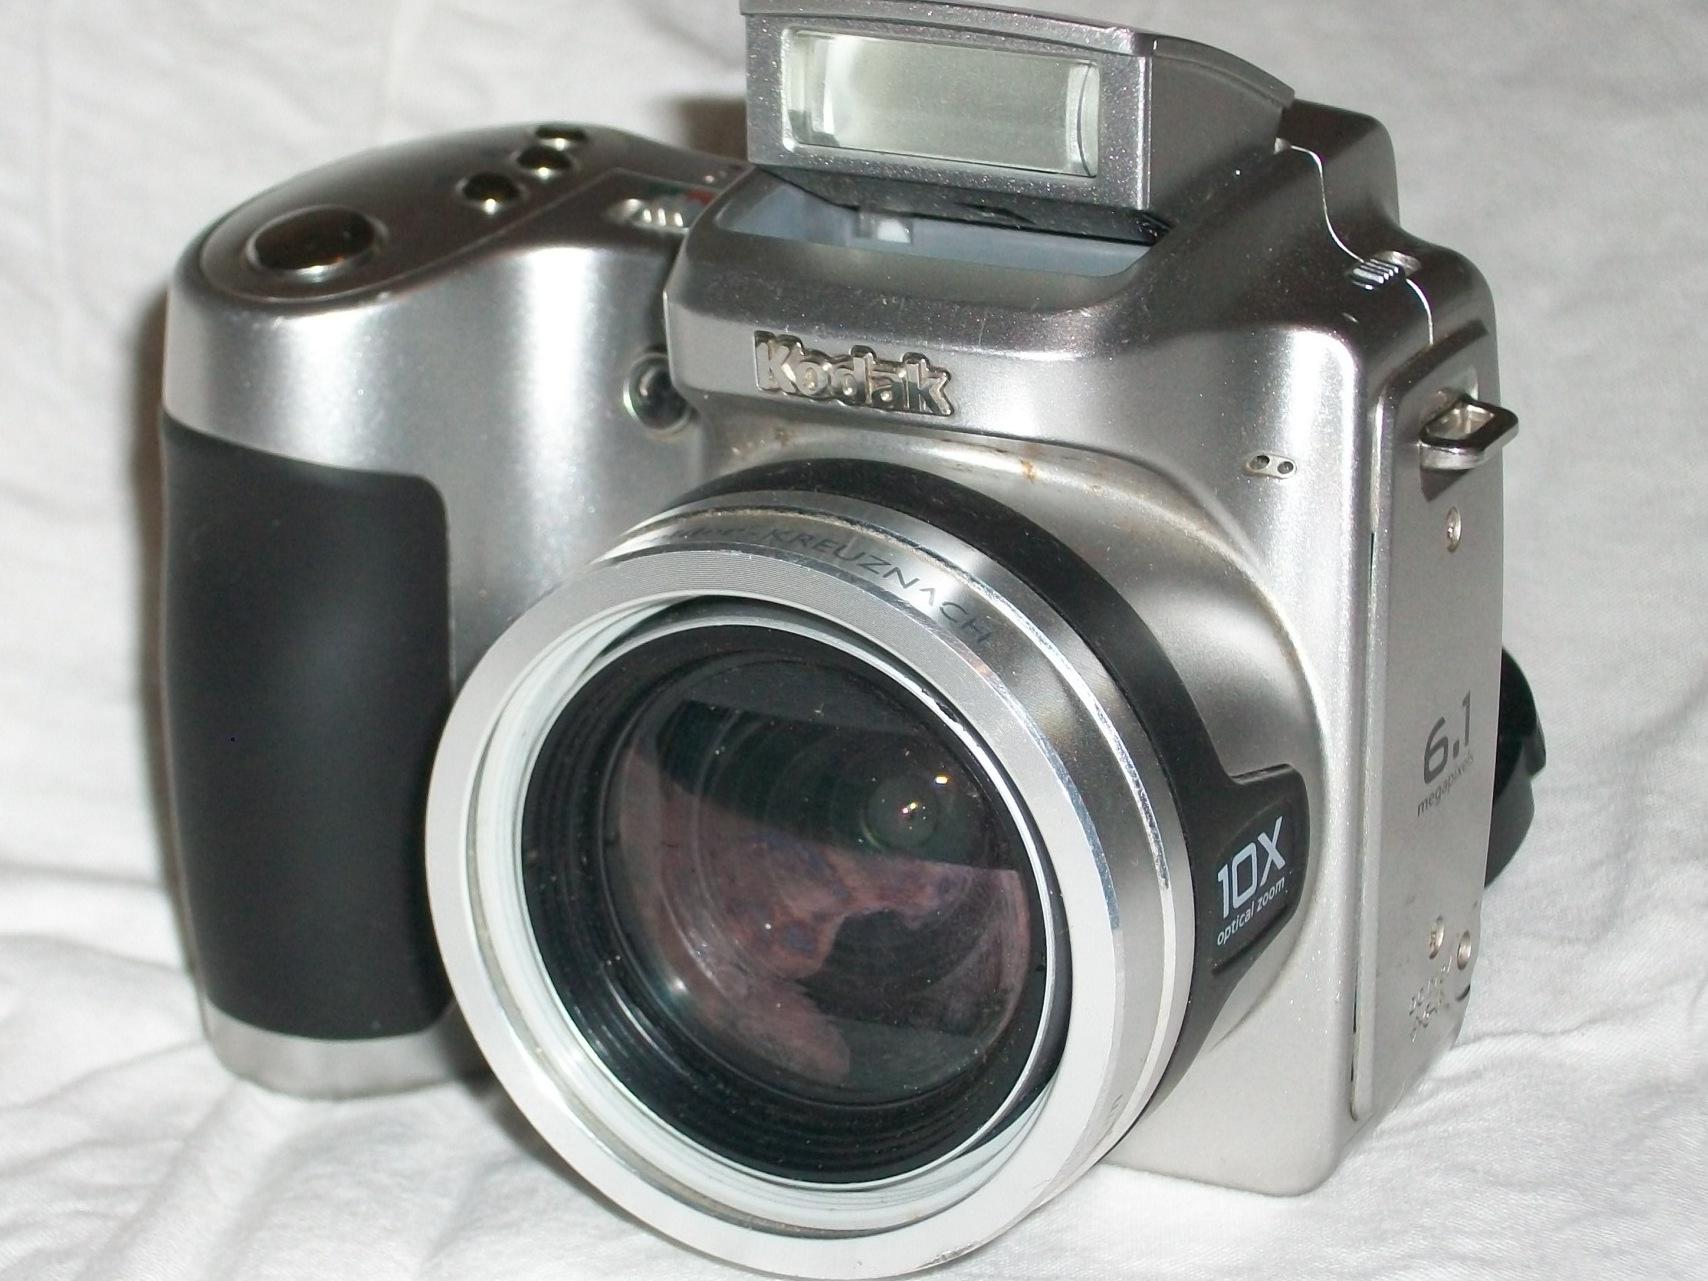 kodak easyshare z650 repair ifixit rh ifixit com Kodak EasyShare Z650 SD Card Kodak EasyShare Z650 SD Card